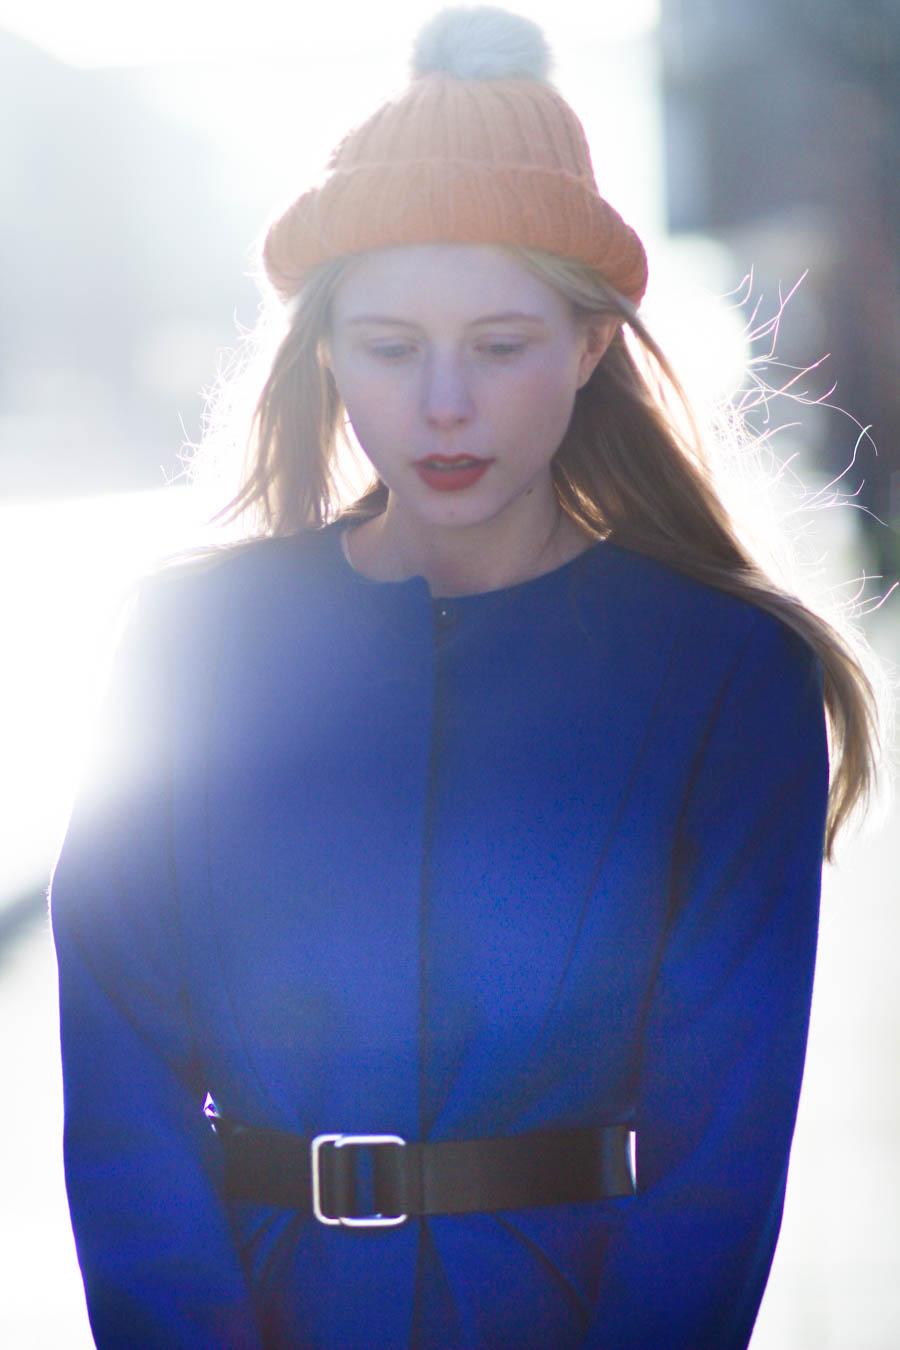 outfit December nemesis babe marie jensen danish blogger -6-2